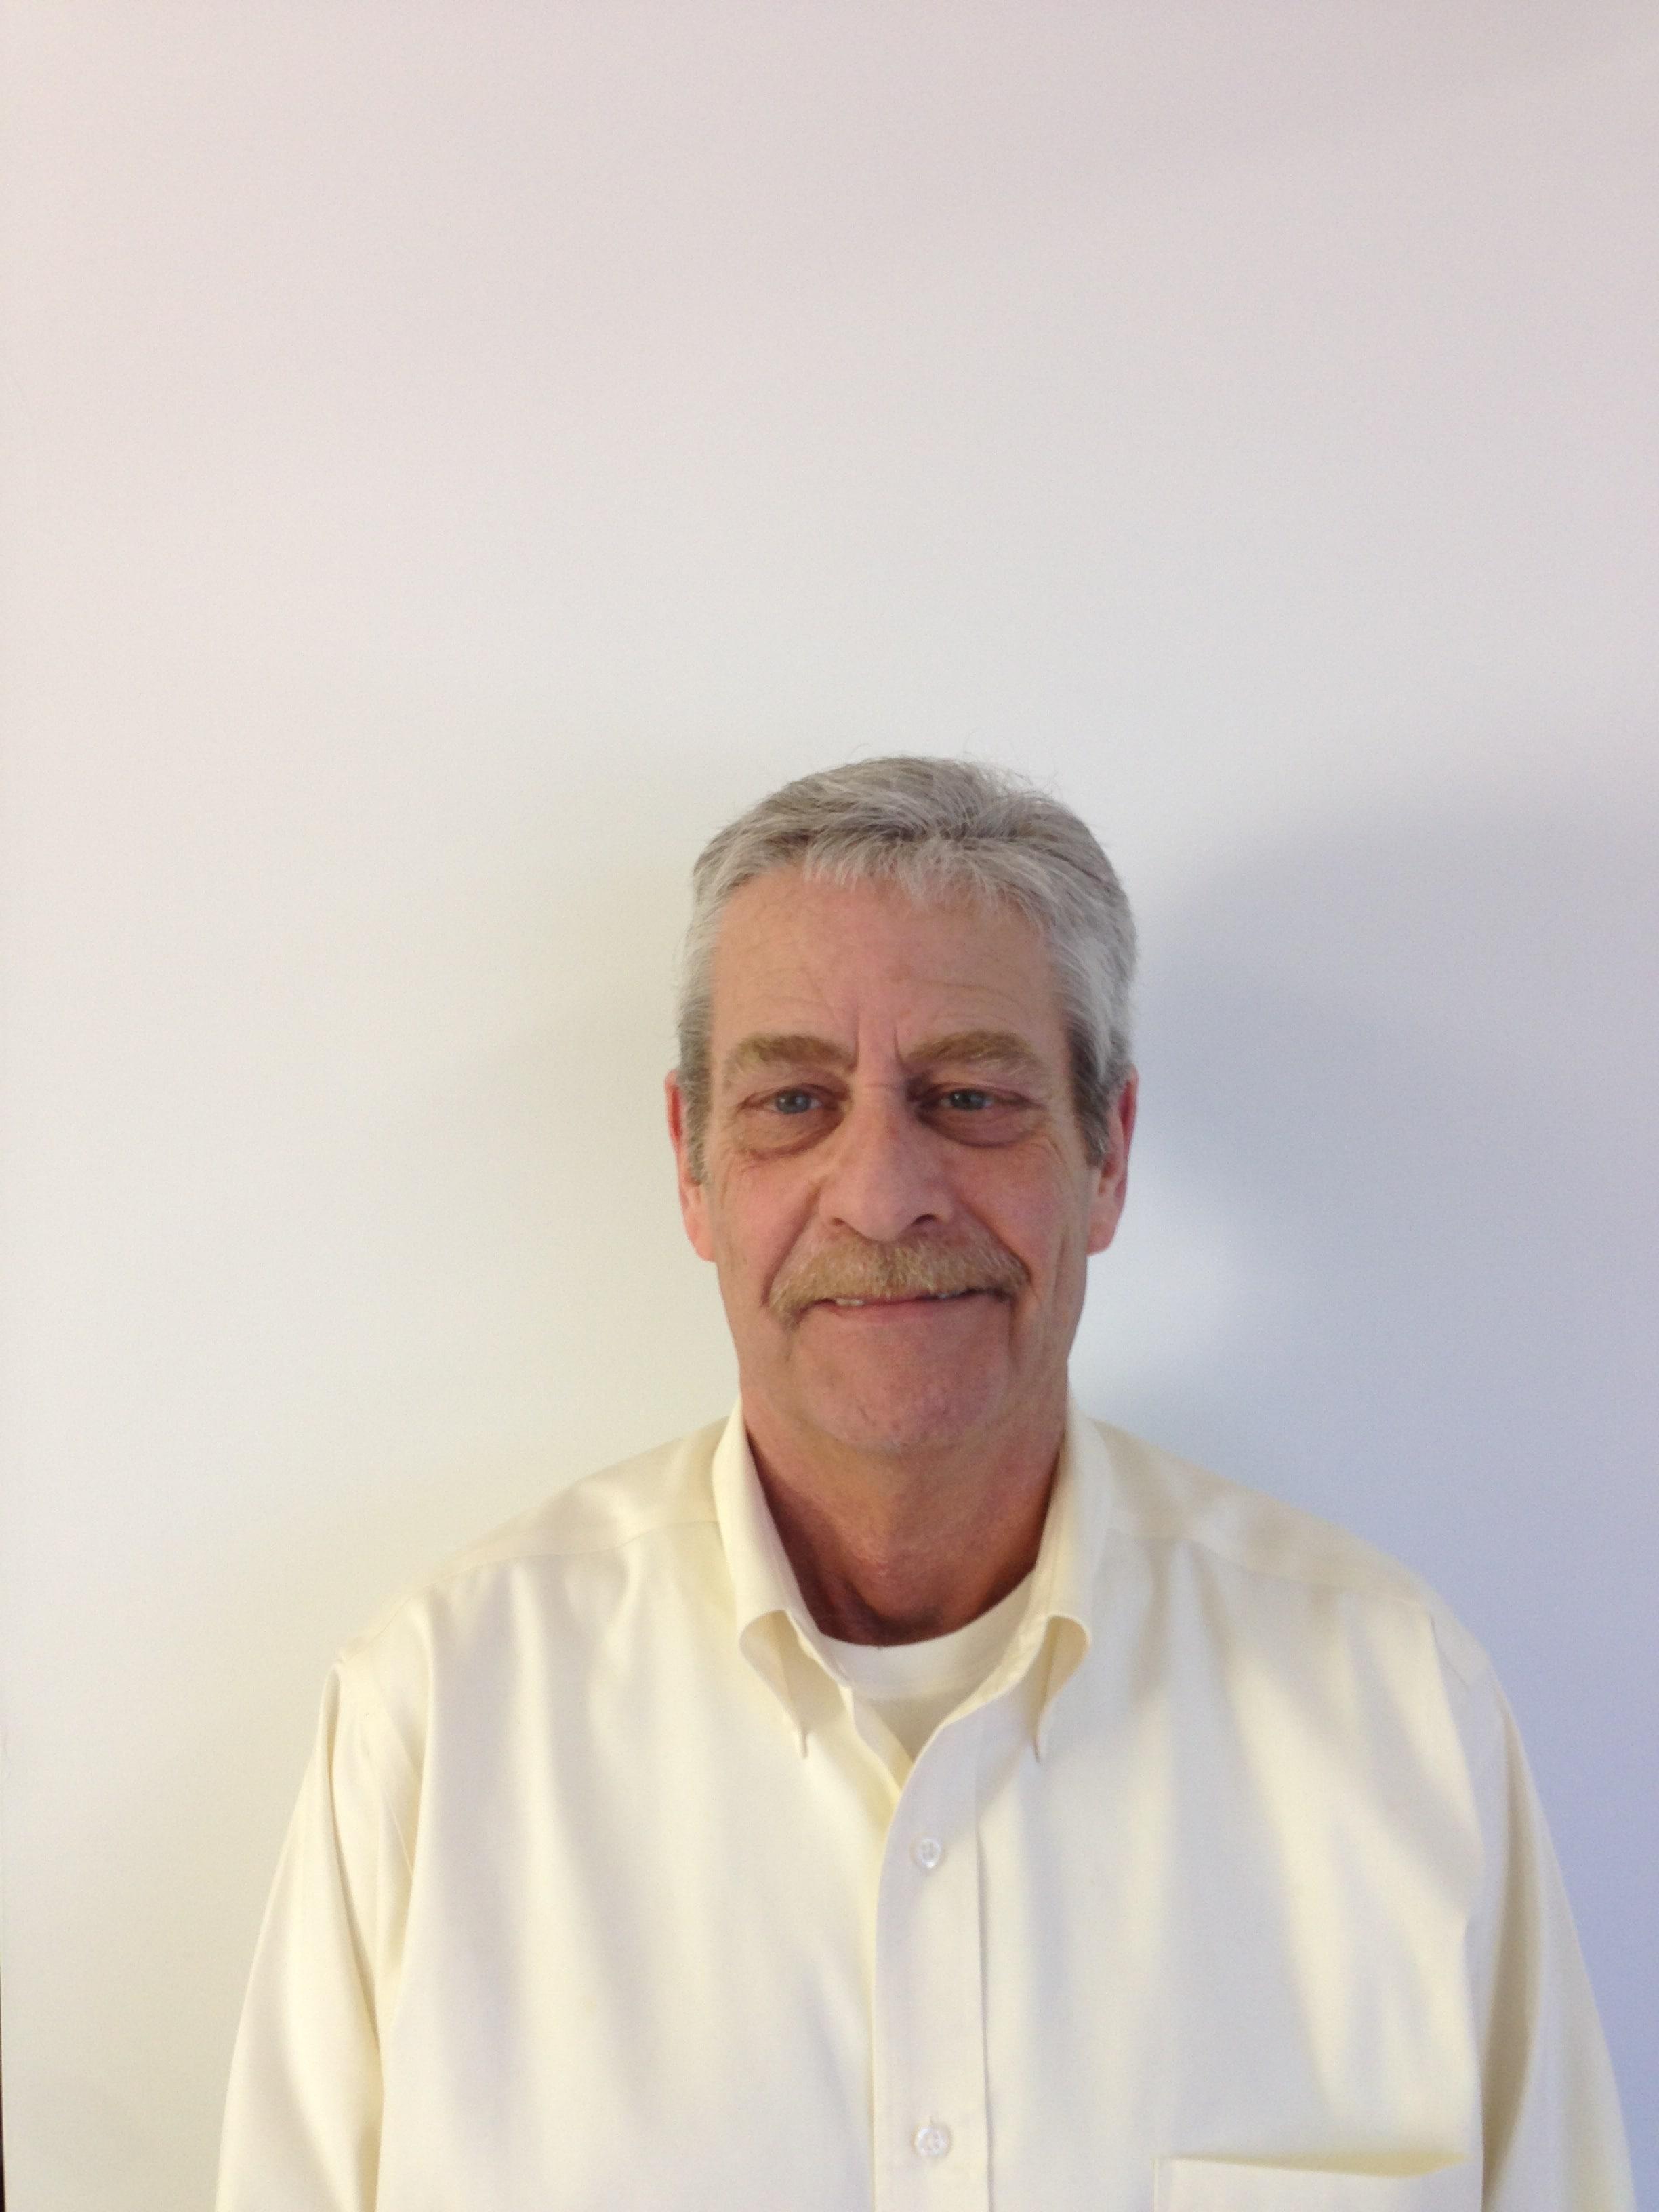 Steve Shepherd Warransburg